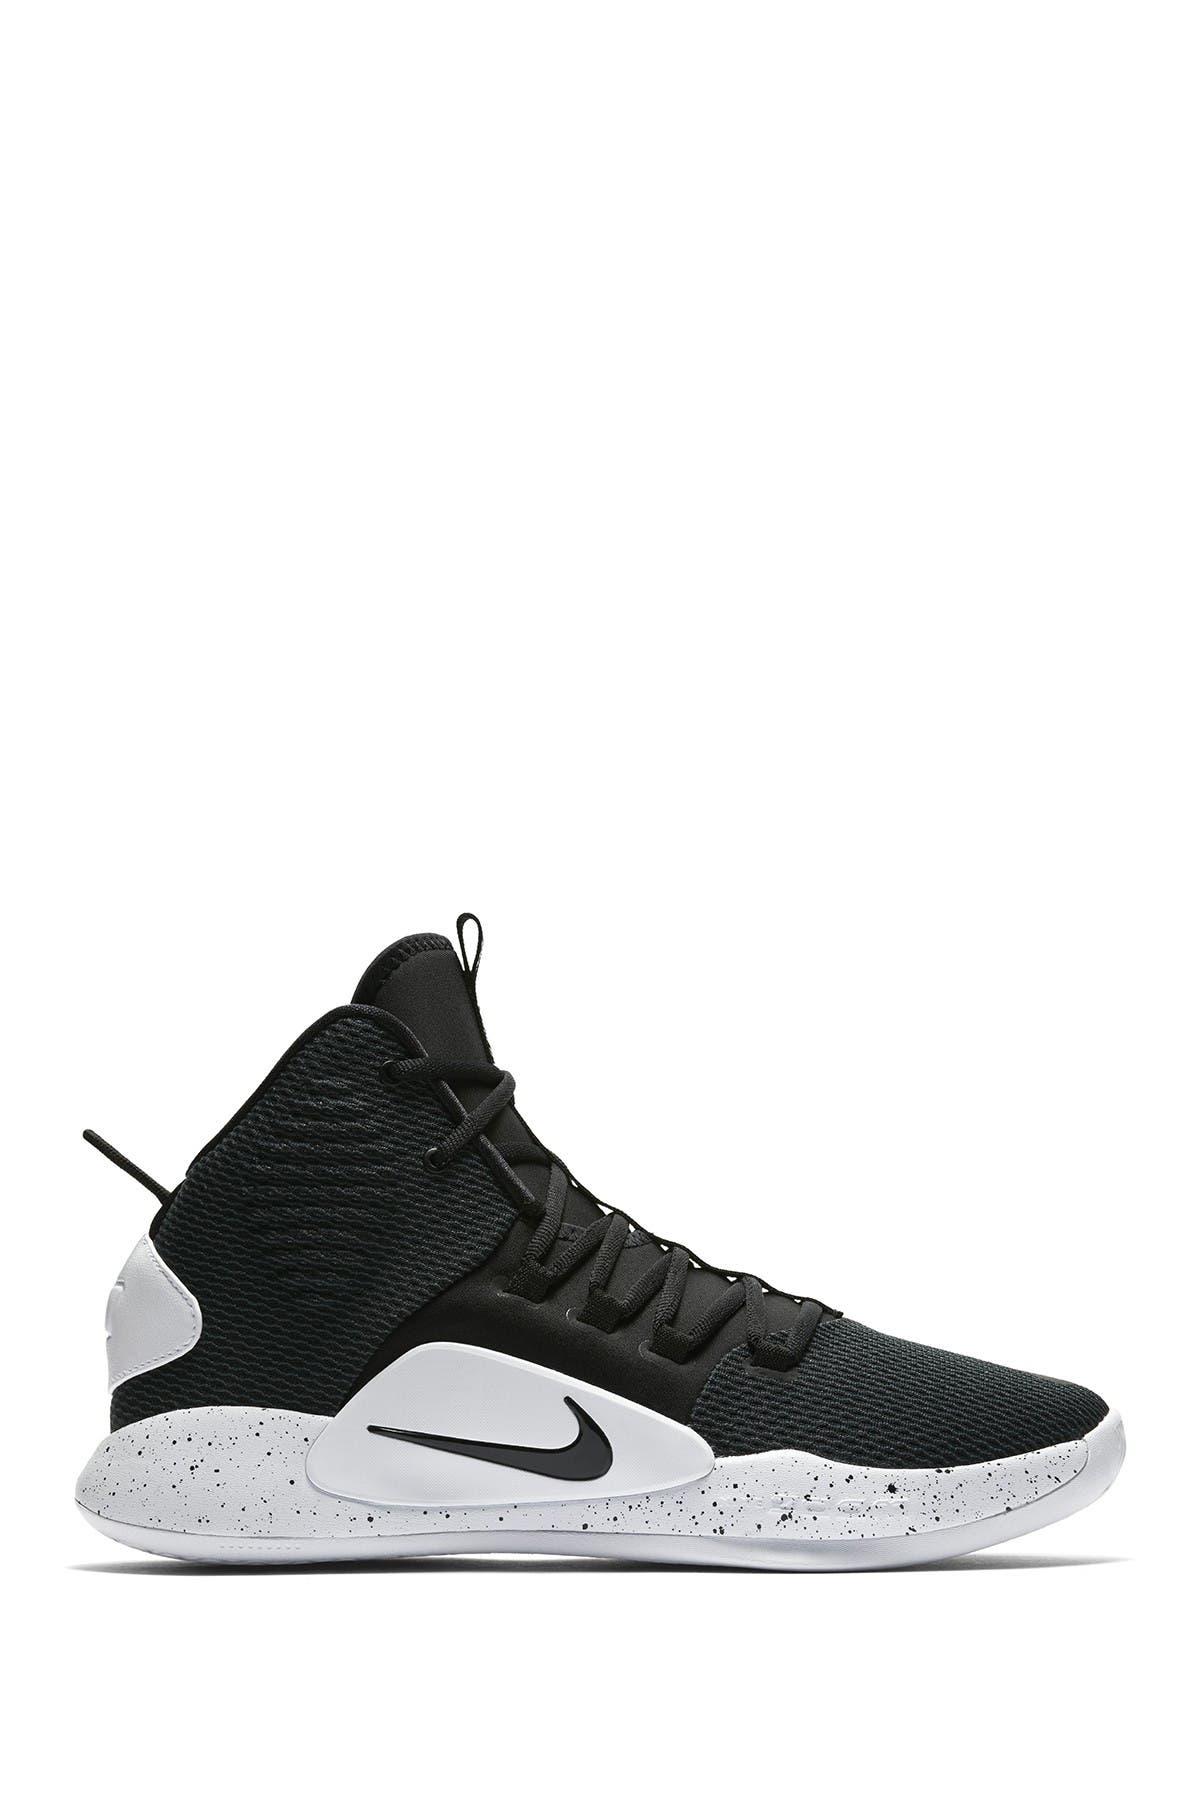 Nike | Hyperdunk X Basketball Sneaker